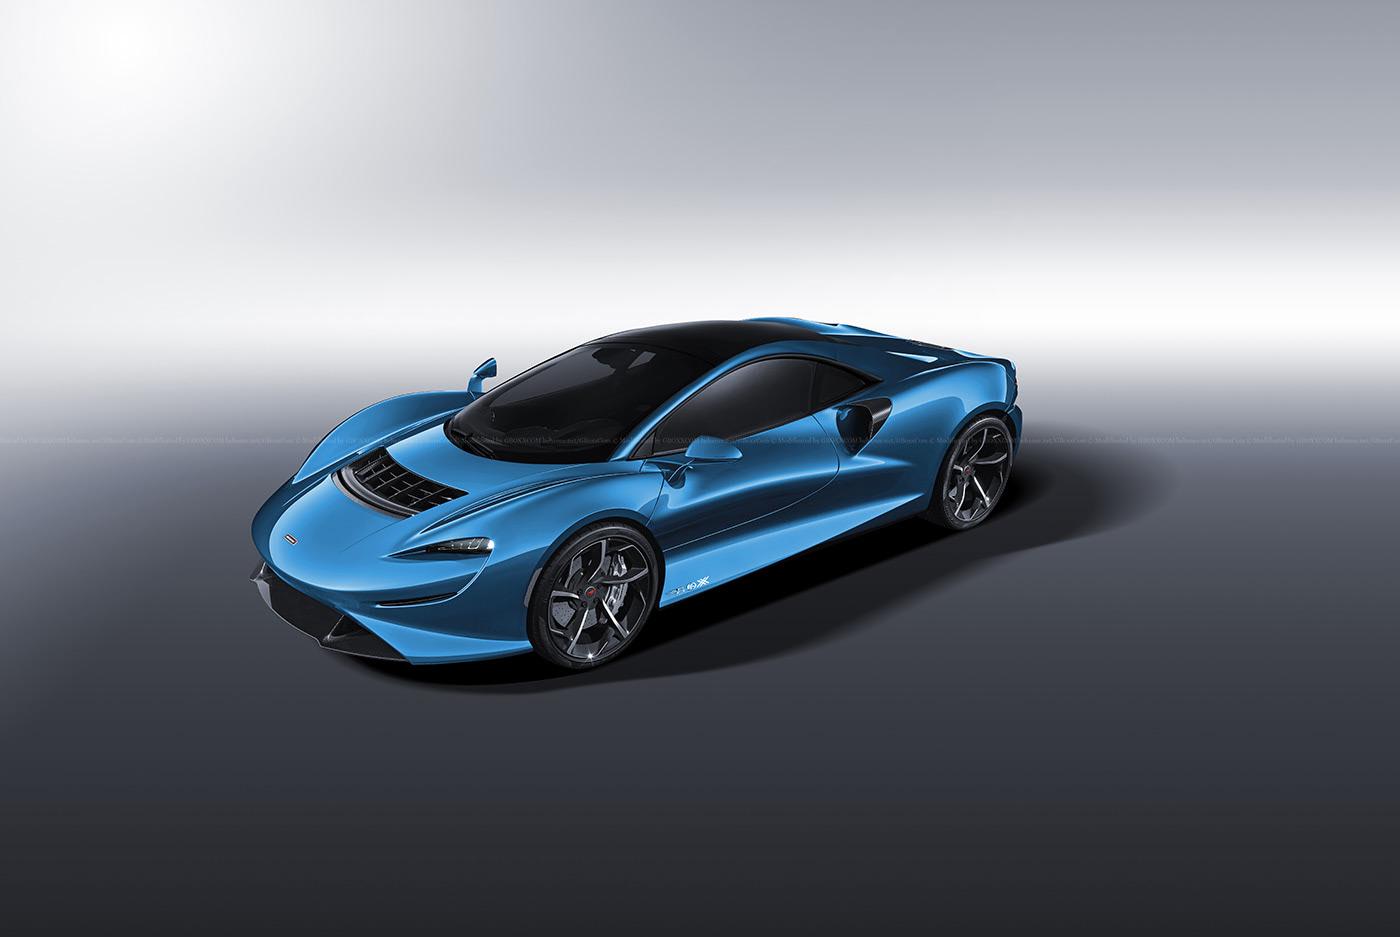 2020-McLaren-Elva-Coupe-1